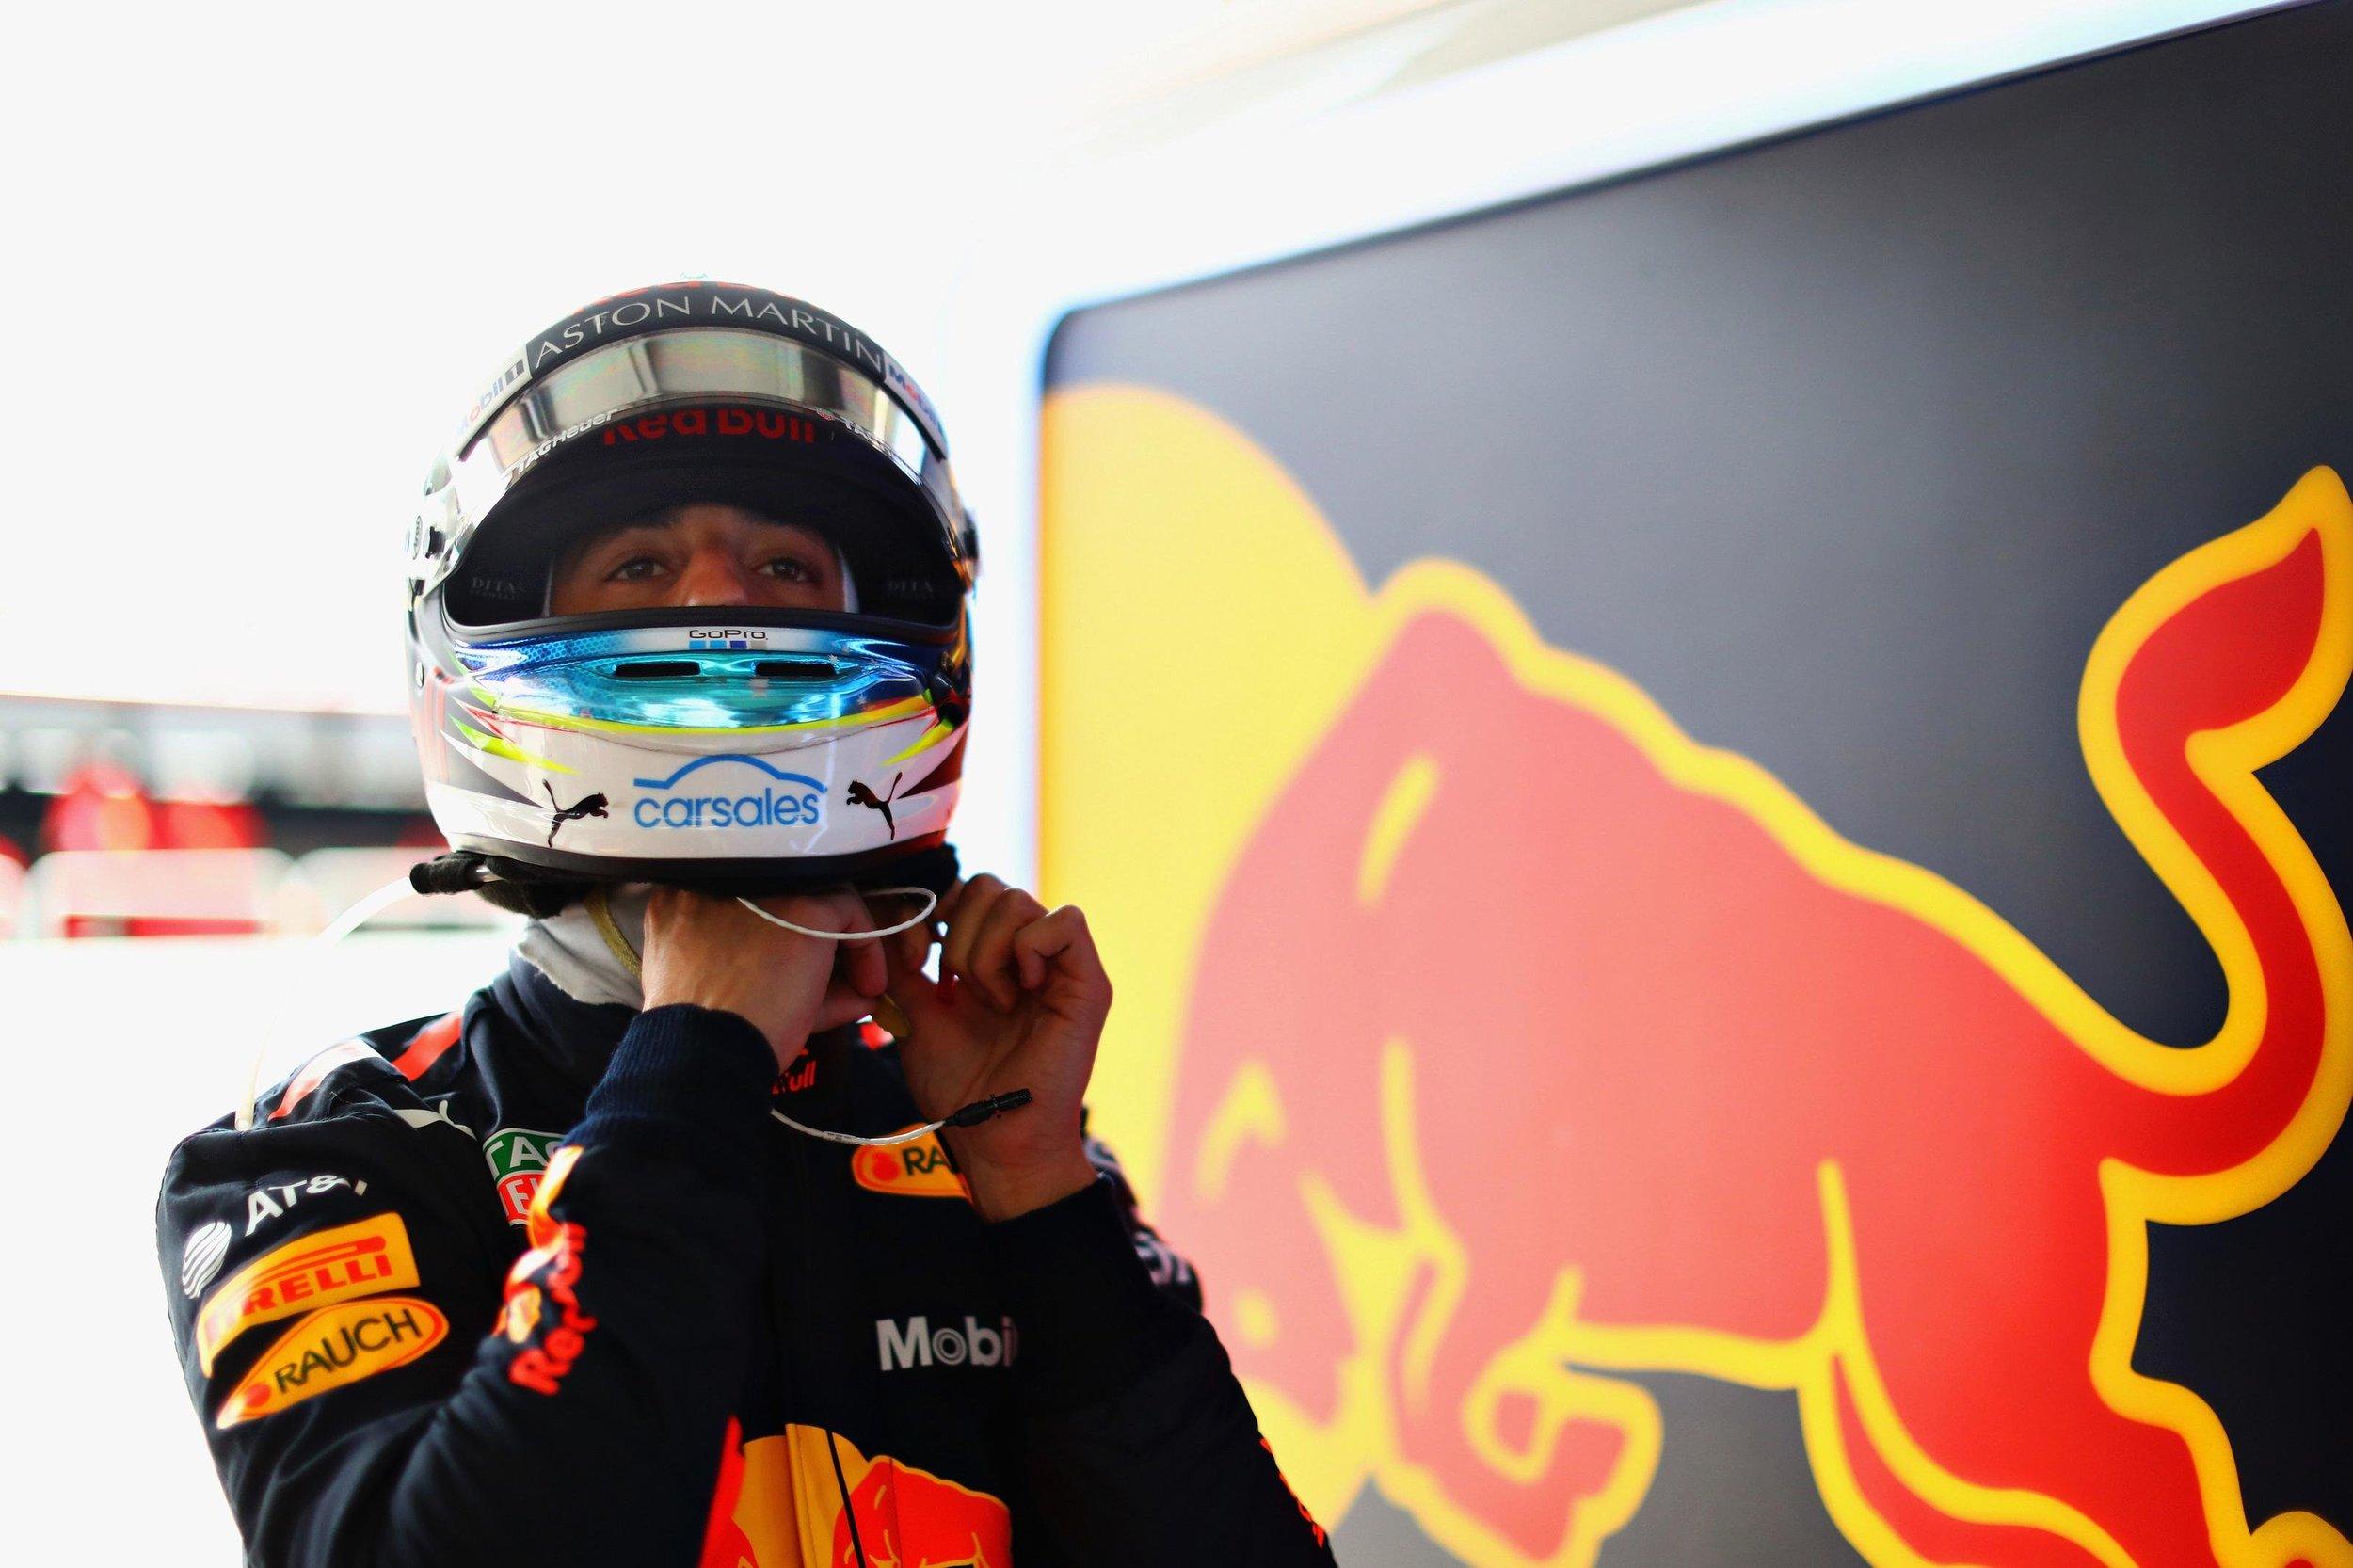 daniel_ricciardo_red_bull_racing_brazilian_f1_grand_prix_2018.jpg